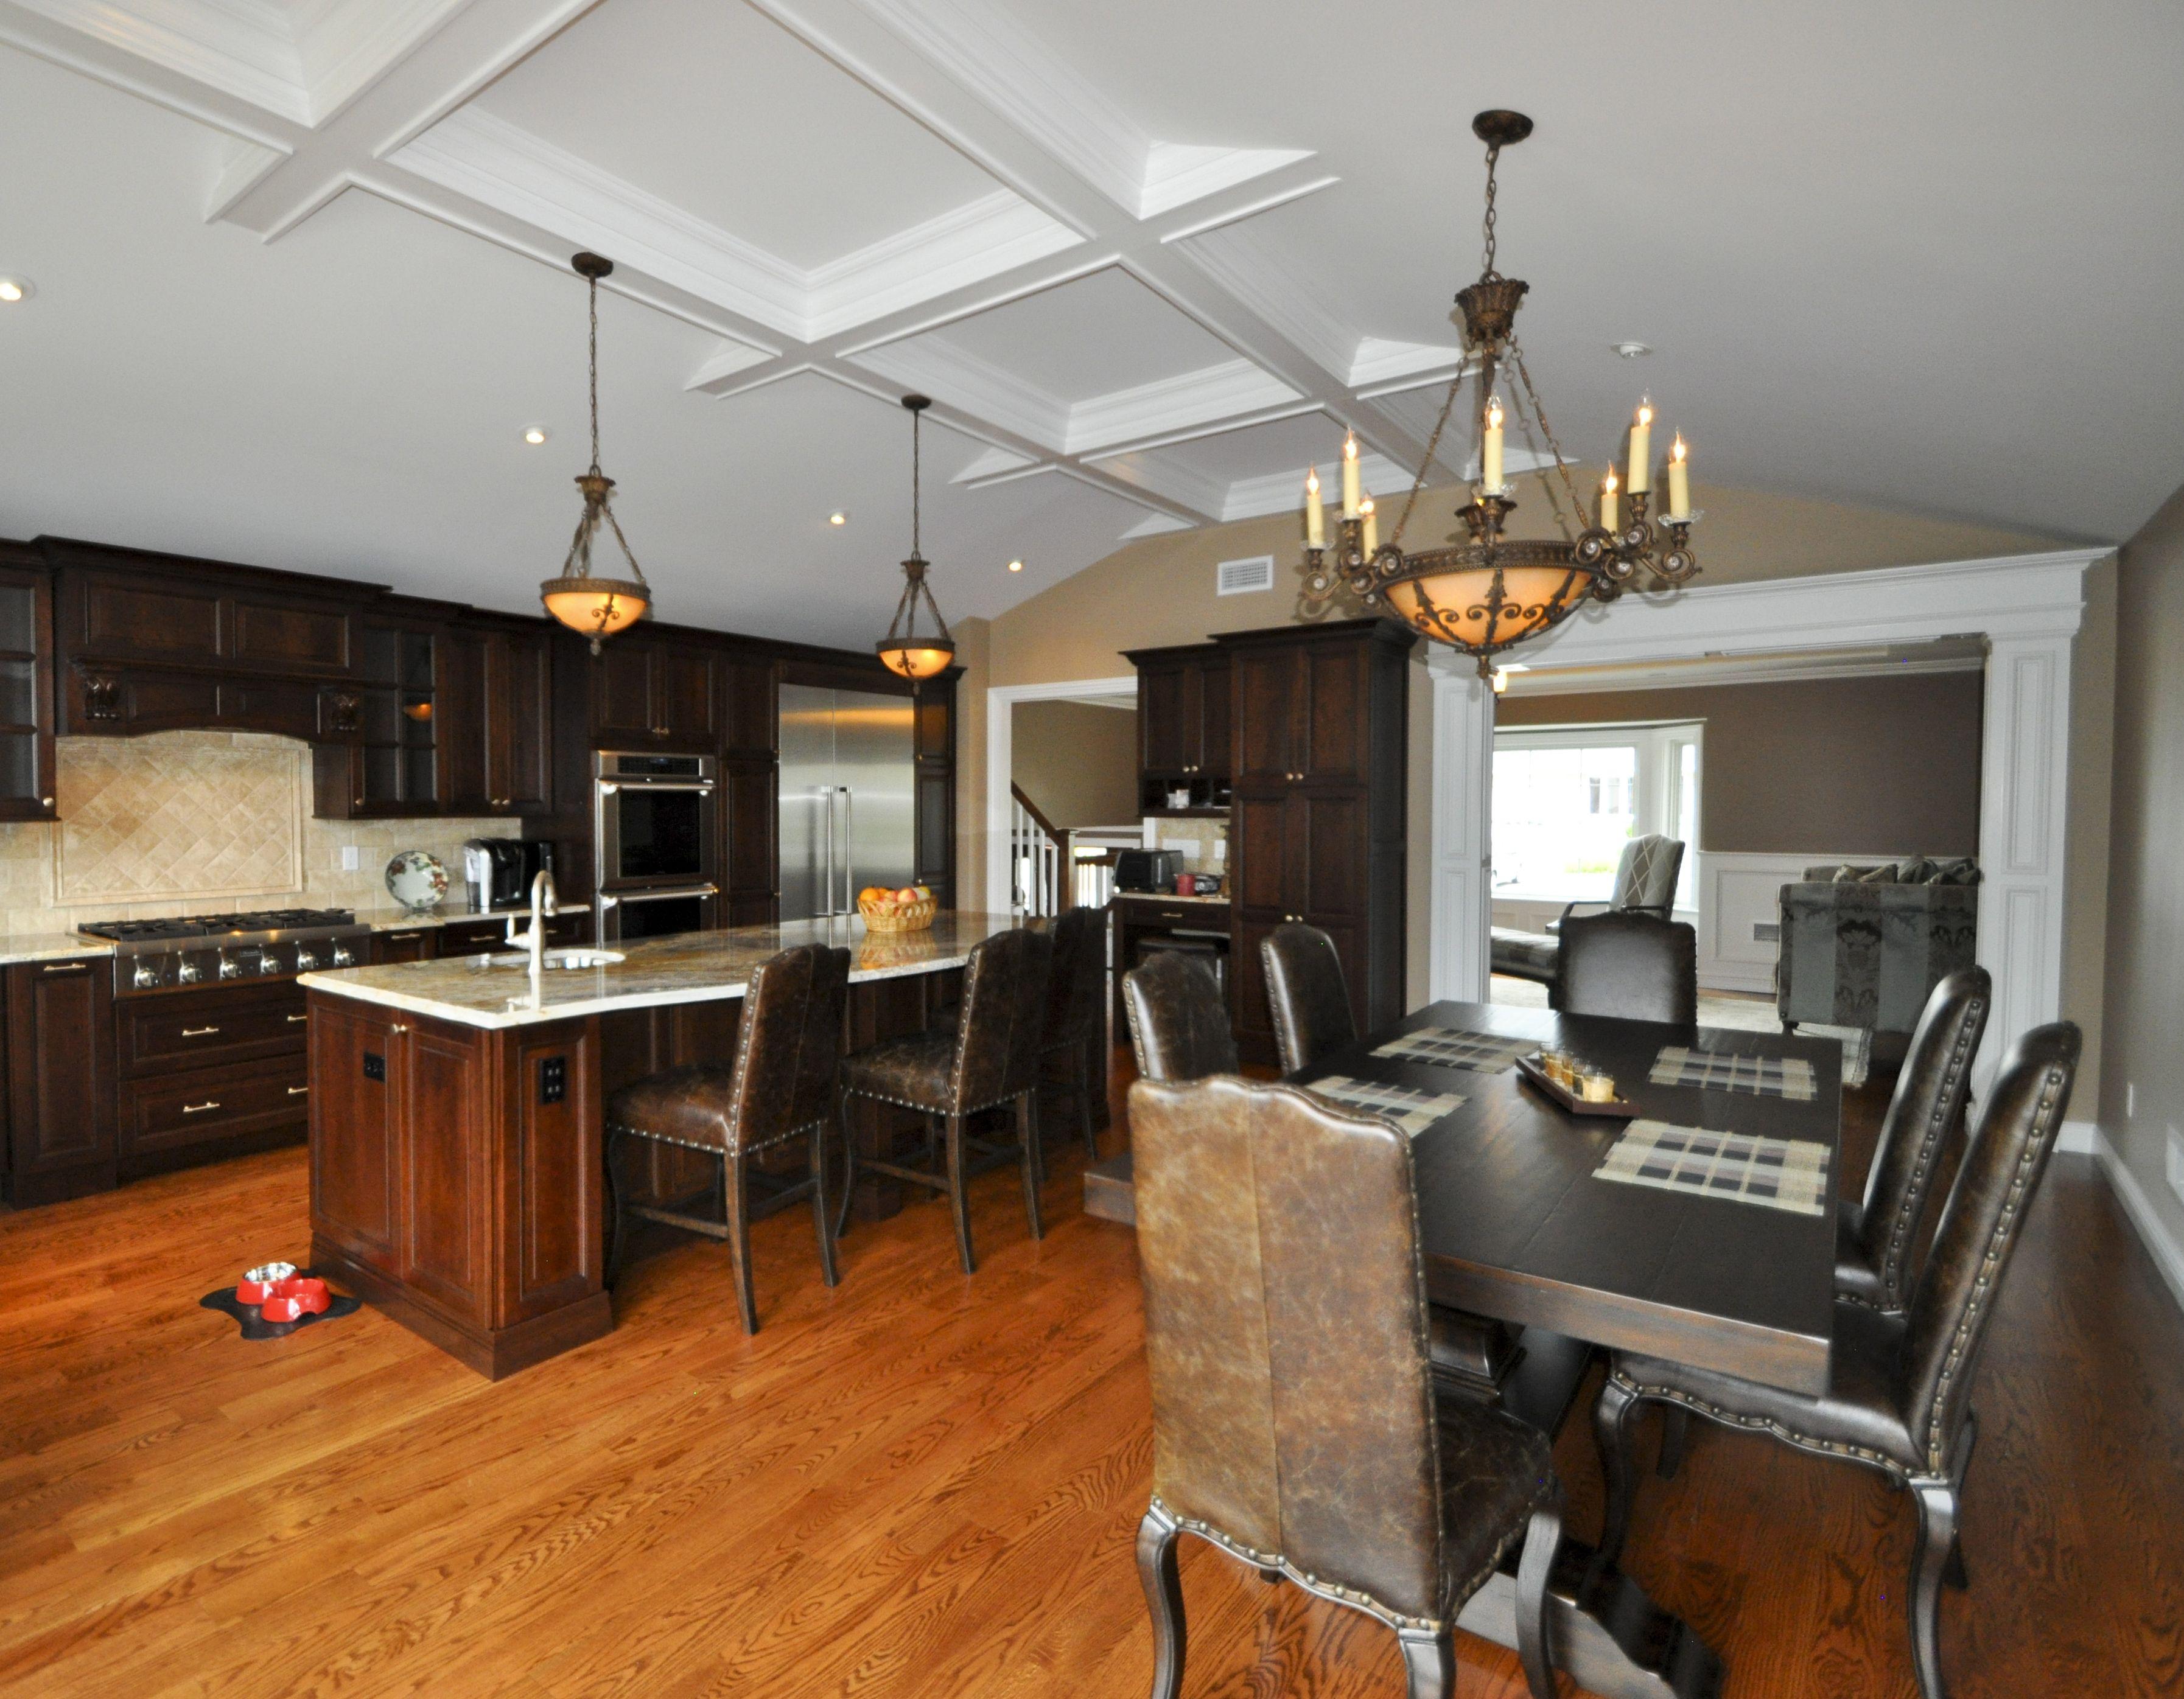 custom kitchen with open floor plan to dining room